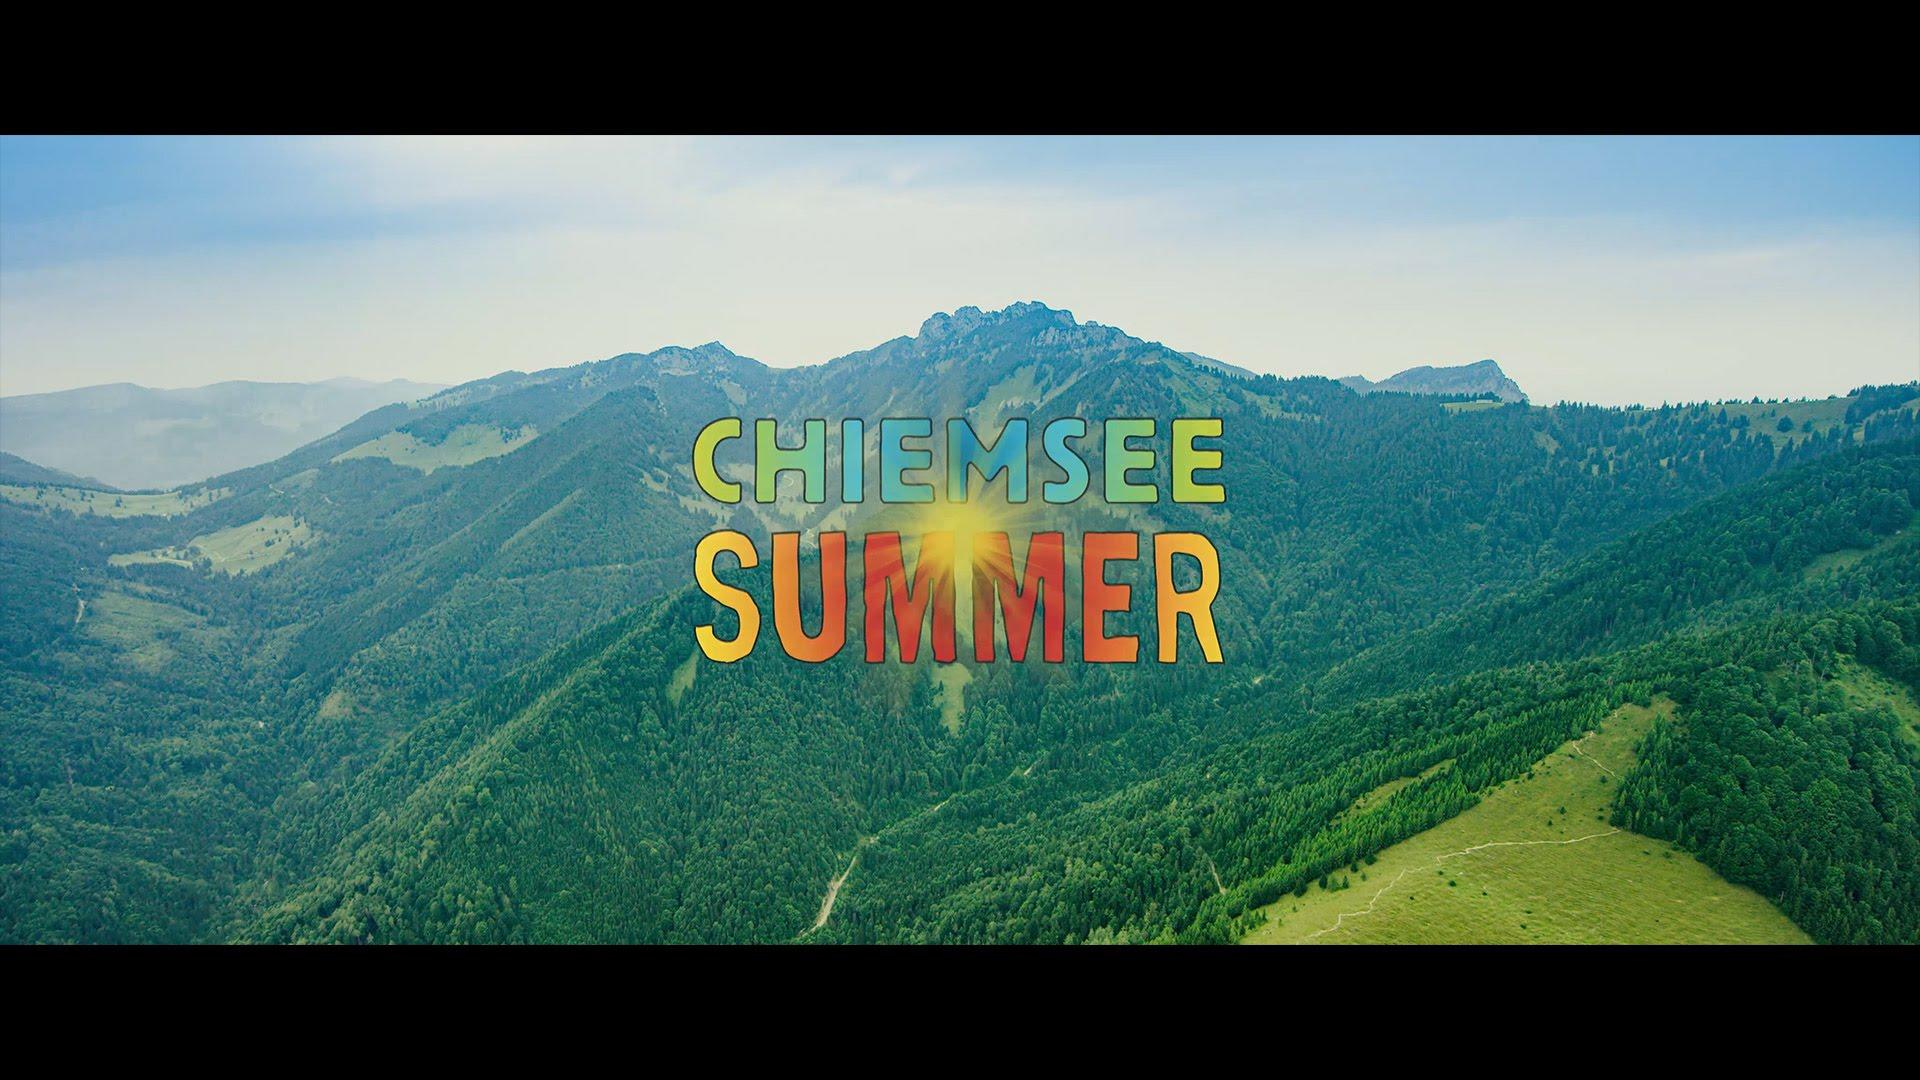 Chiemsee Summer 2015 - Aftermovie [9/4/2015]